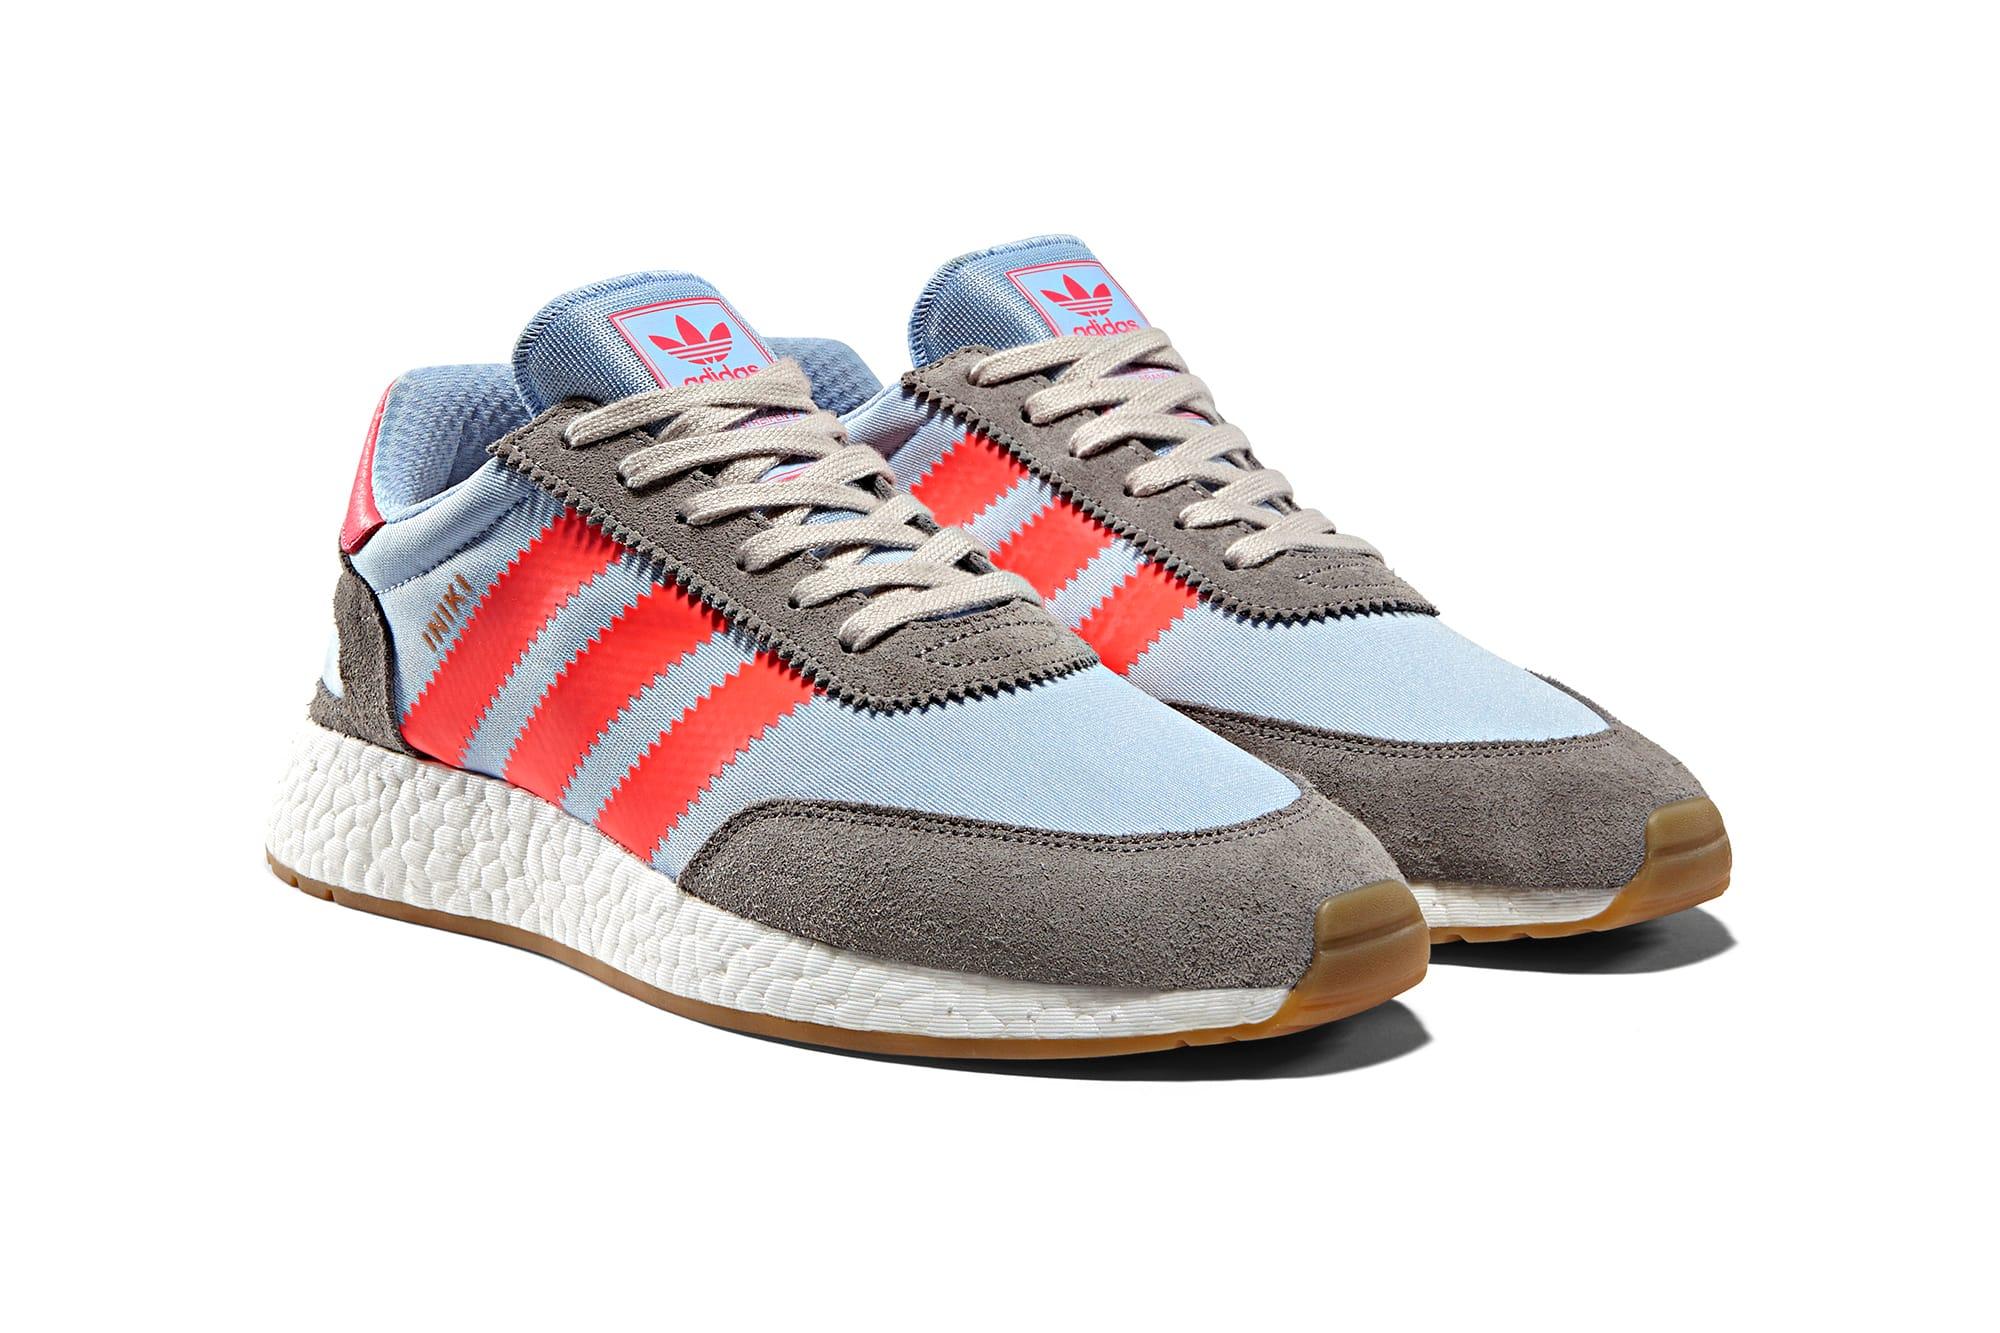 adidas Release Iniki Runner Grey Red